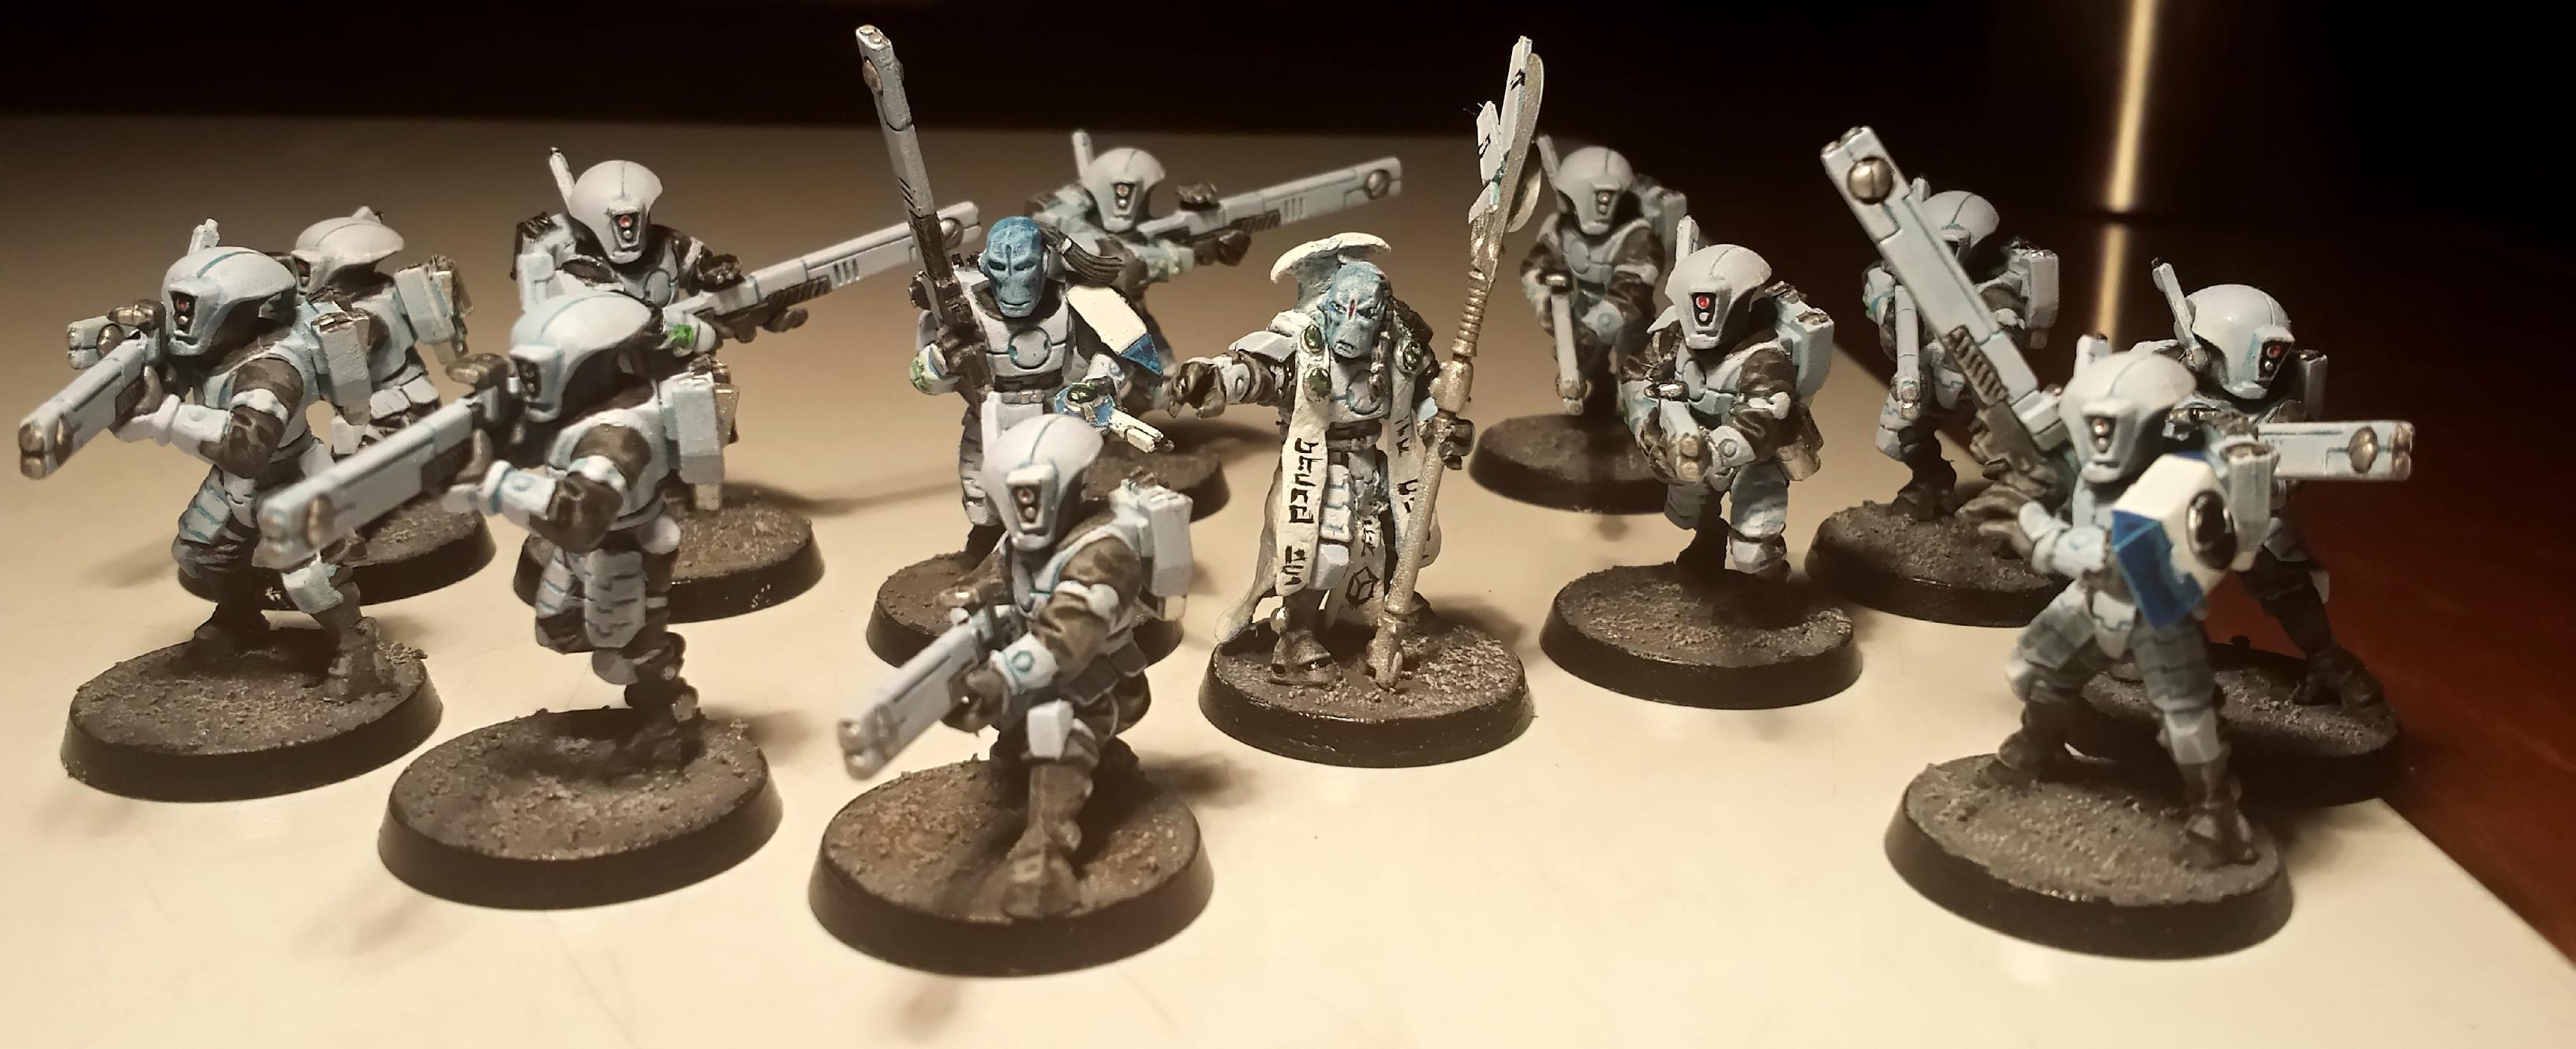 Fire Warriors, Tau, Firewarriors